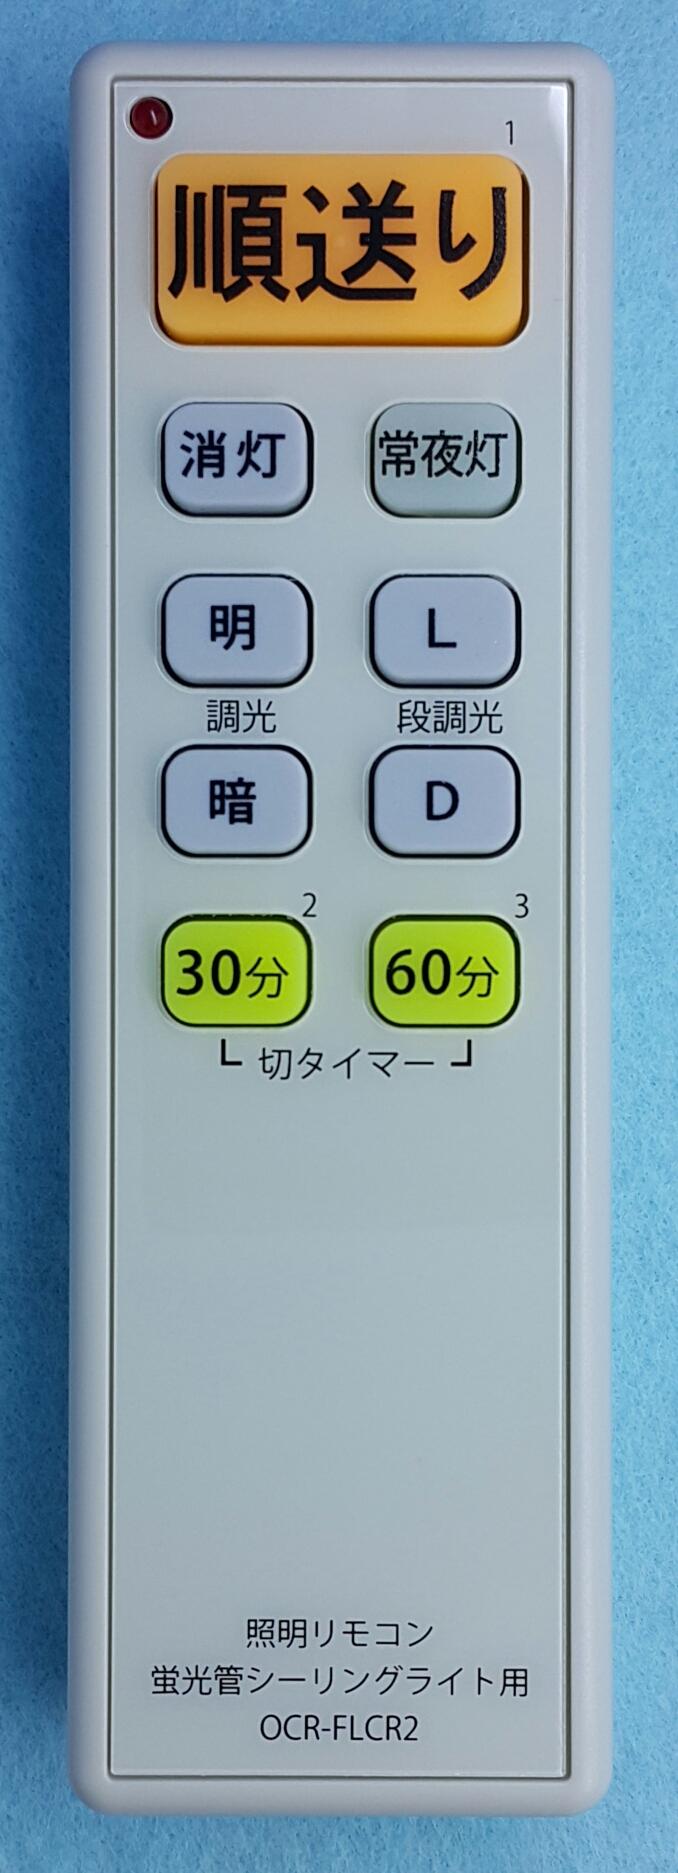 TOSHIBA_OCR-FLCR2_2112_XE730 E11E_LAMP_cover.png